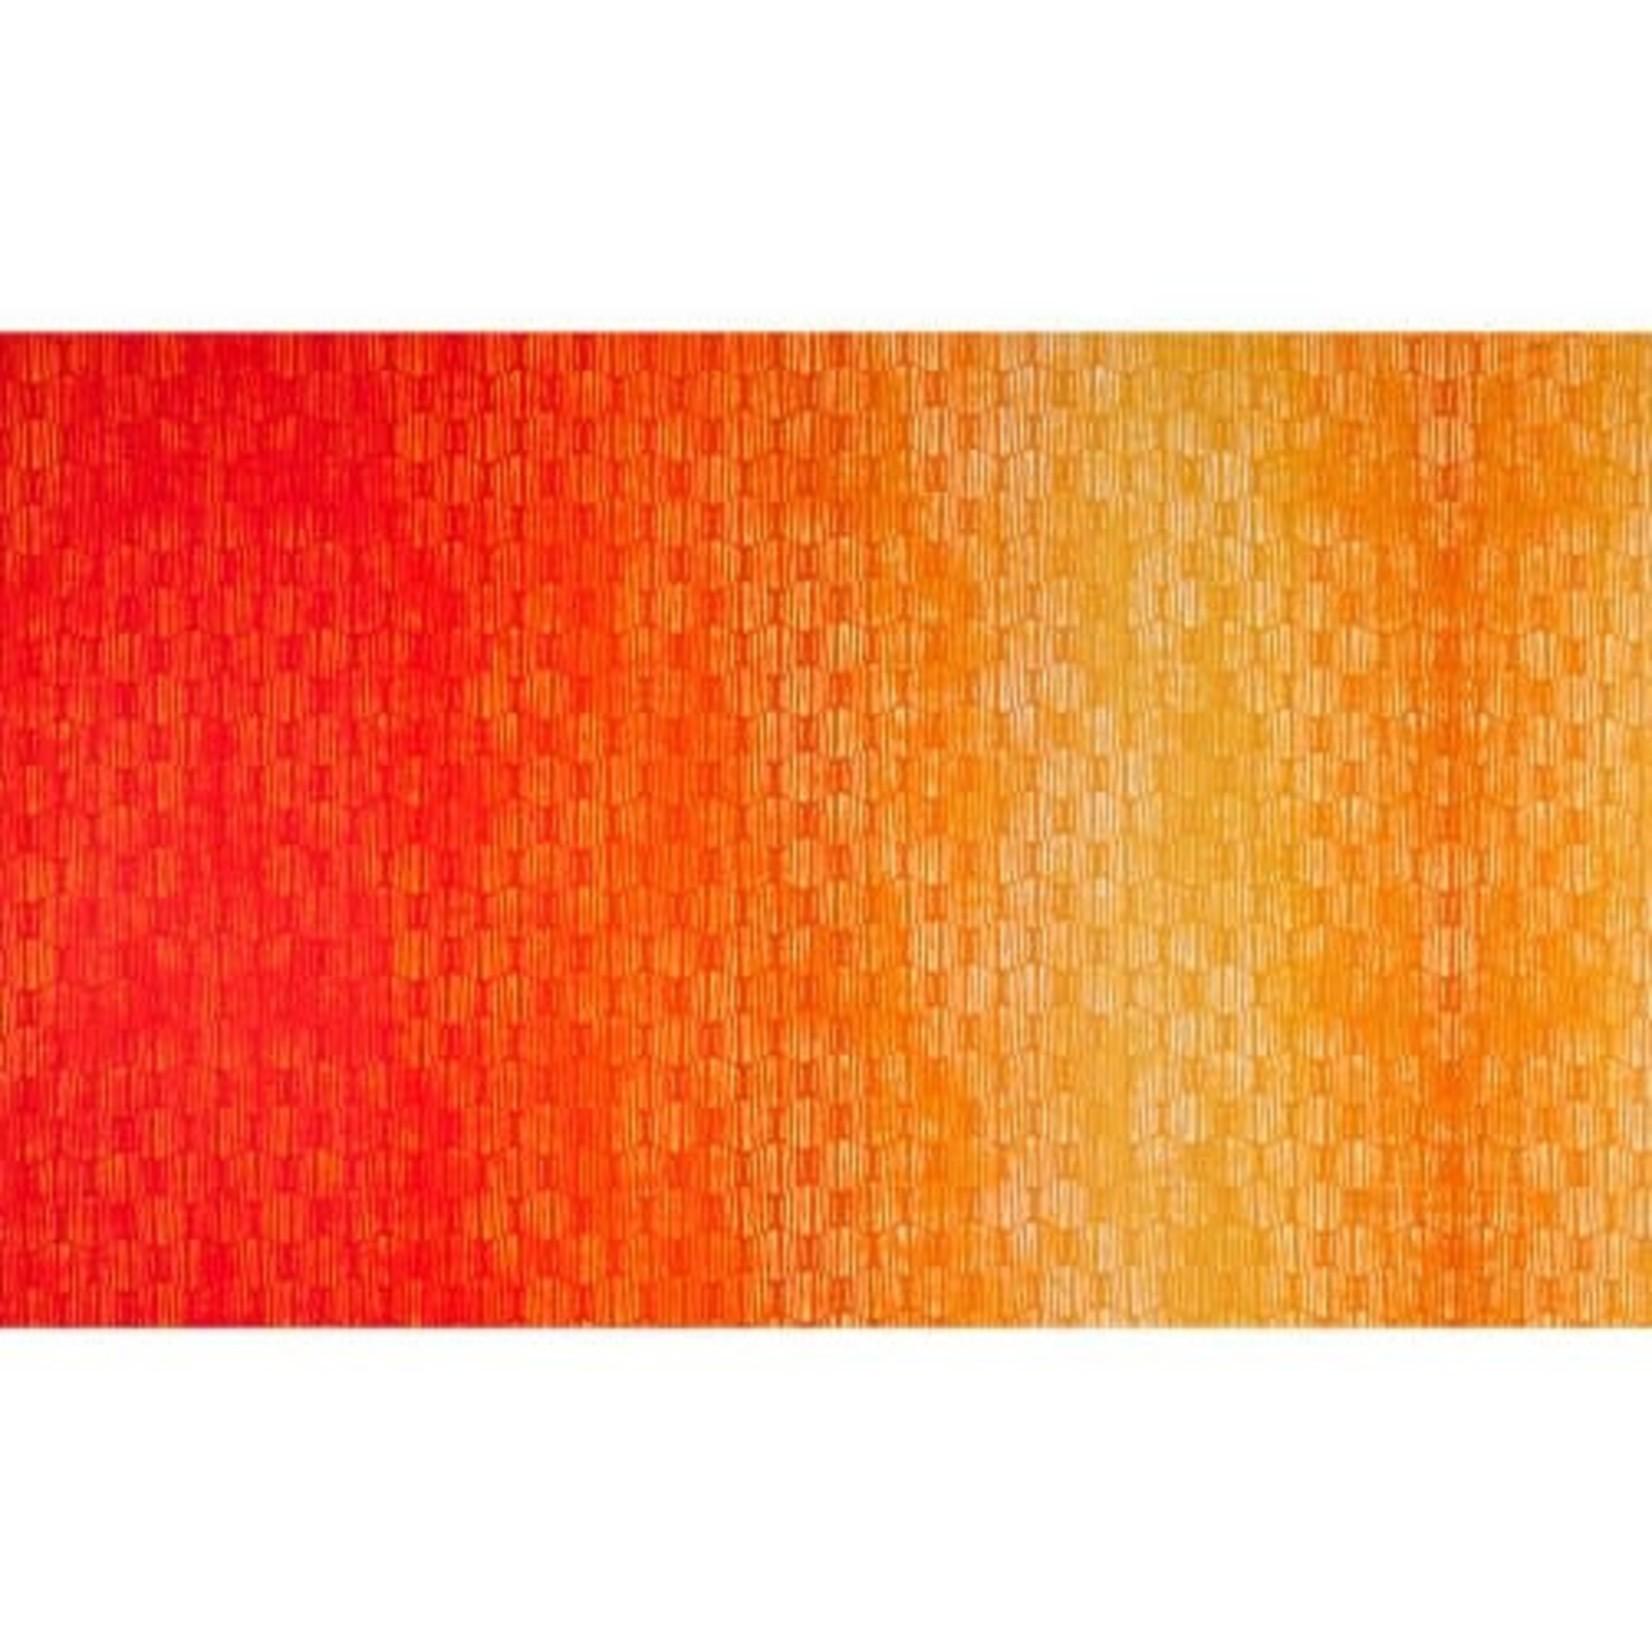 P&B Textiles Meridian - Ombre - Orange